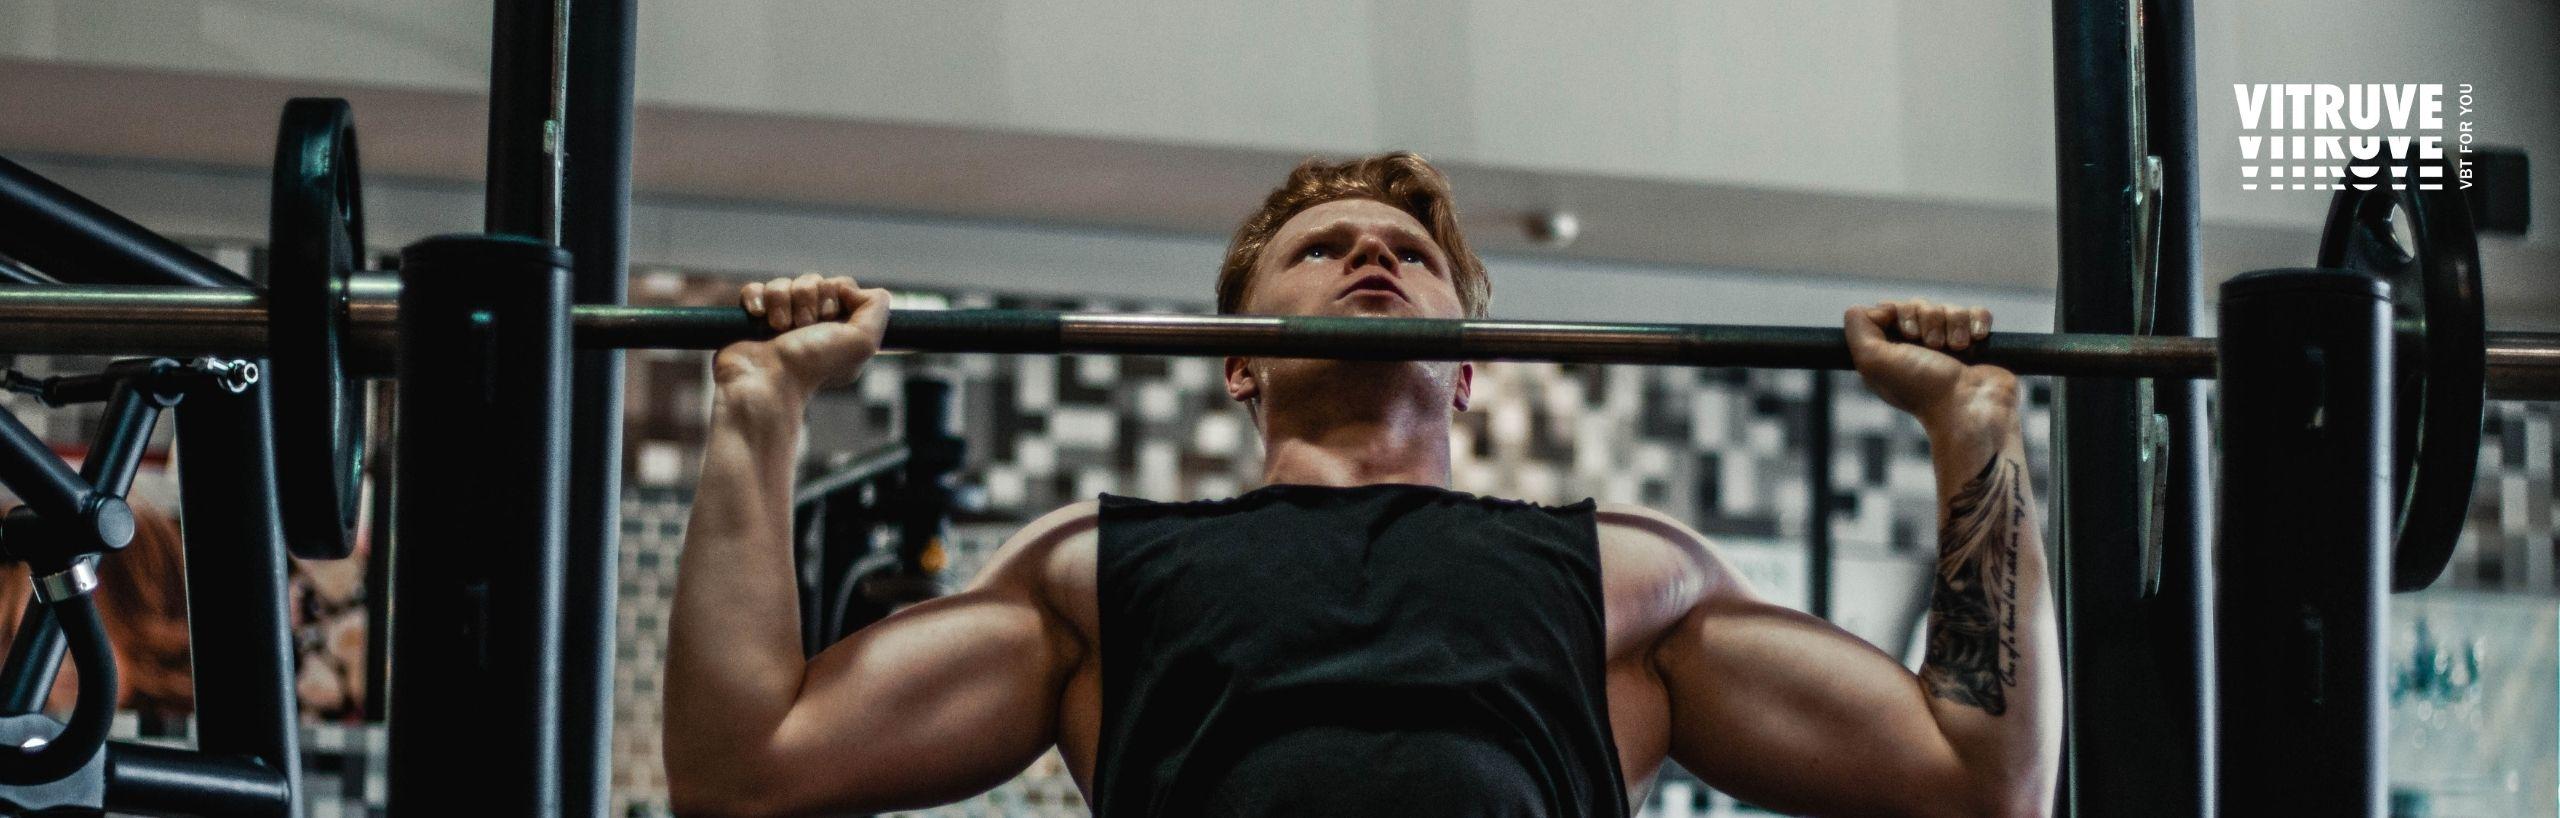 basic-training-for-athletes-basic-guide-for-starting-athletes